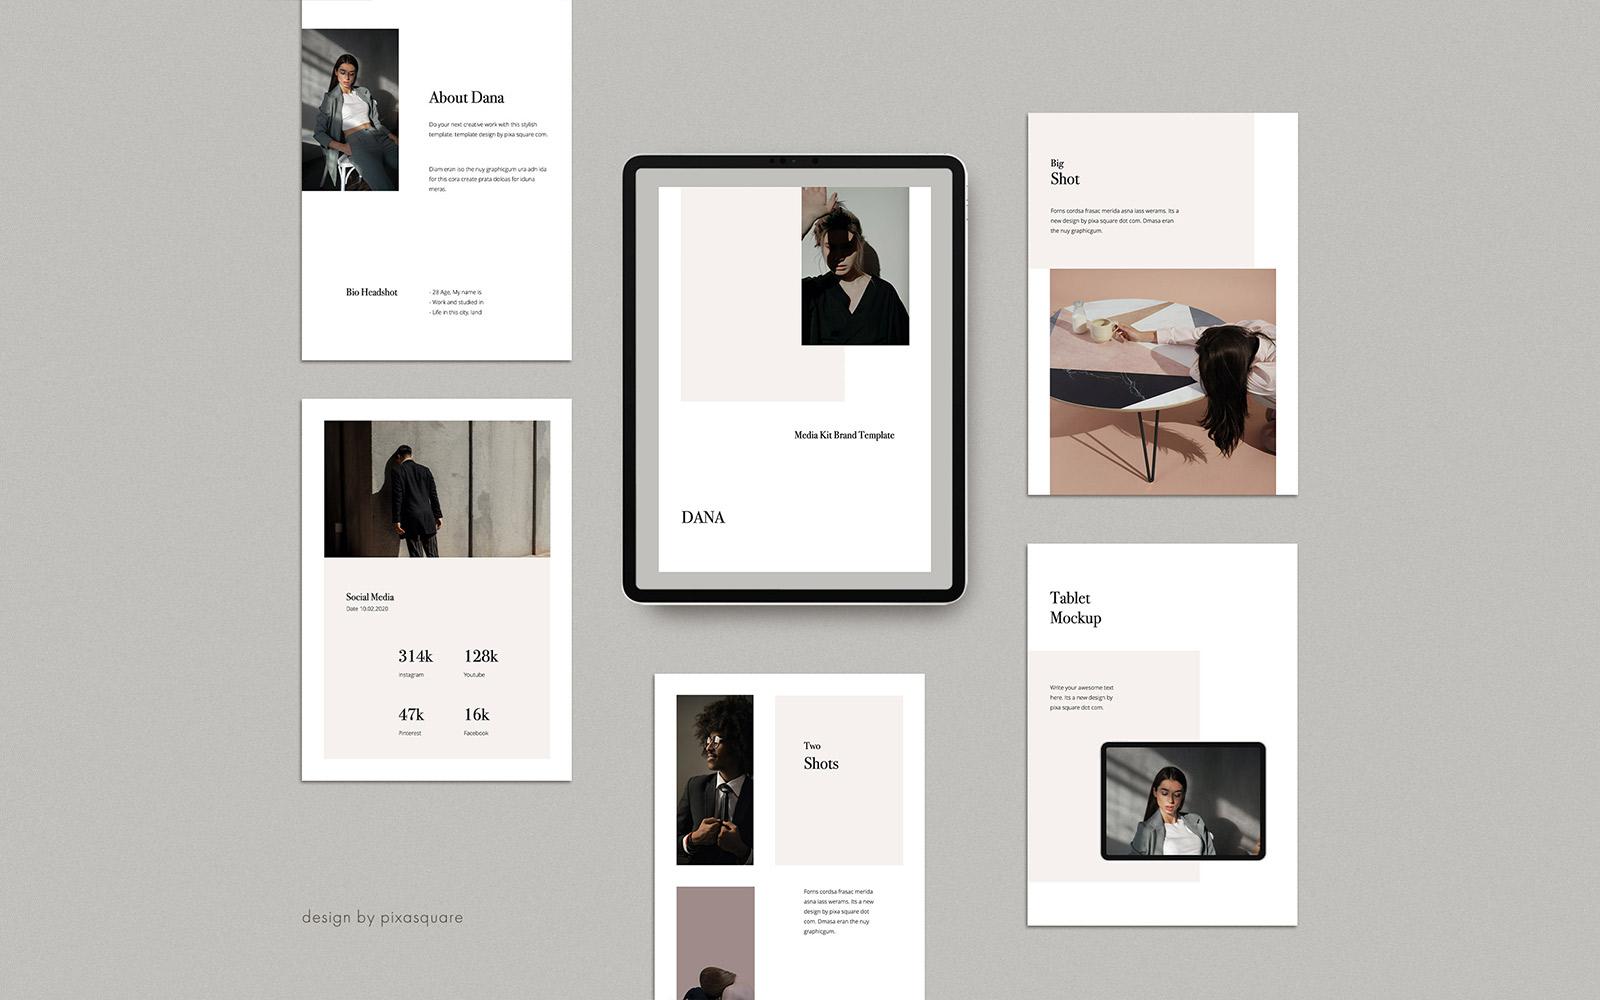 DANA - A4 Vertical Media/Press Kit PowerPoint Template